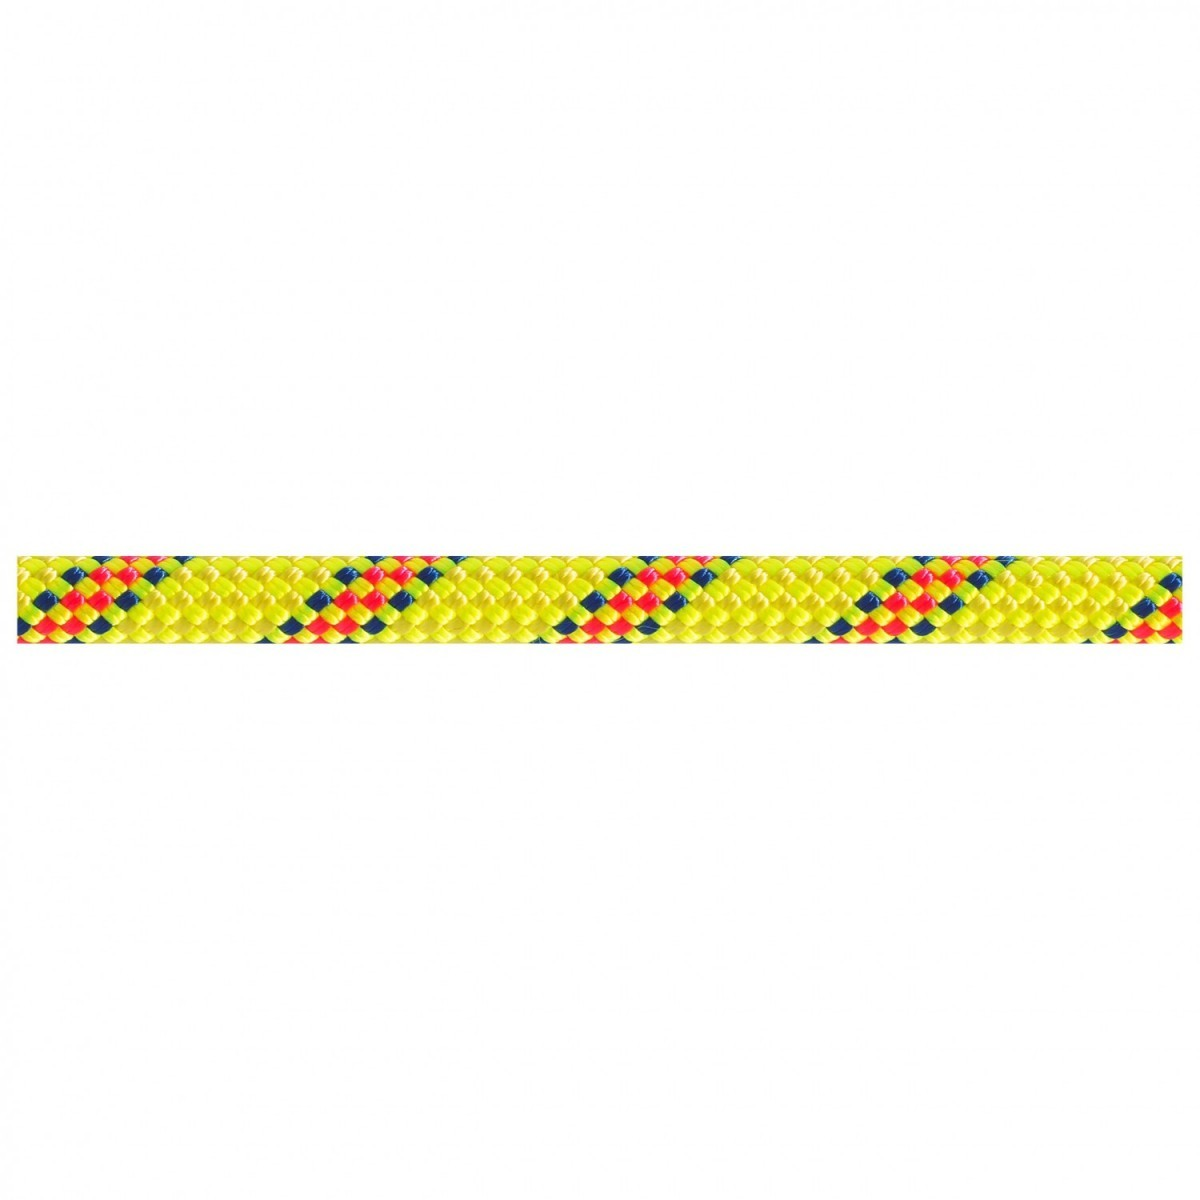 BEAL べアール Karma 9.8(60m - Yellow)★ロープ・ザイル・登山・クライミング★